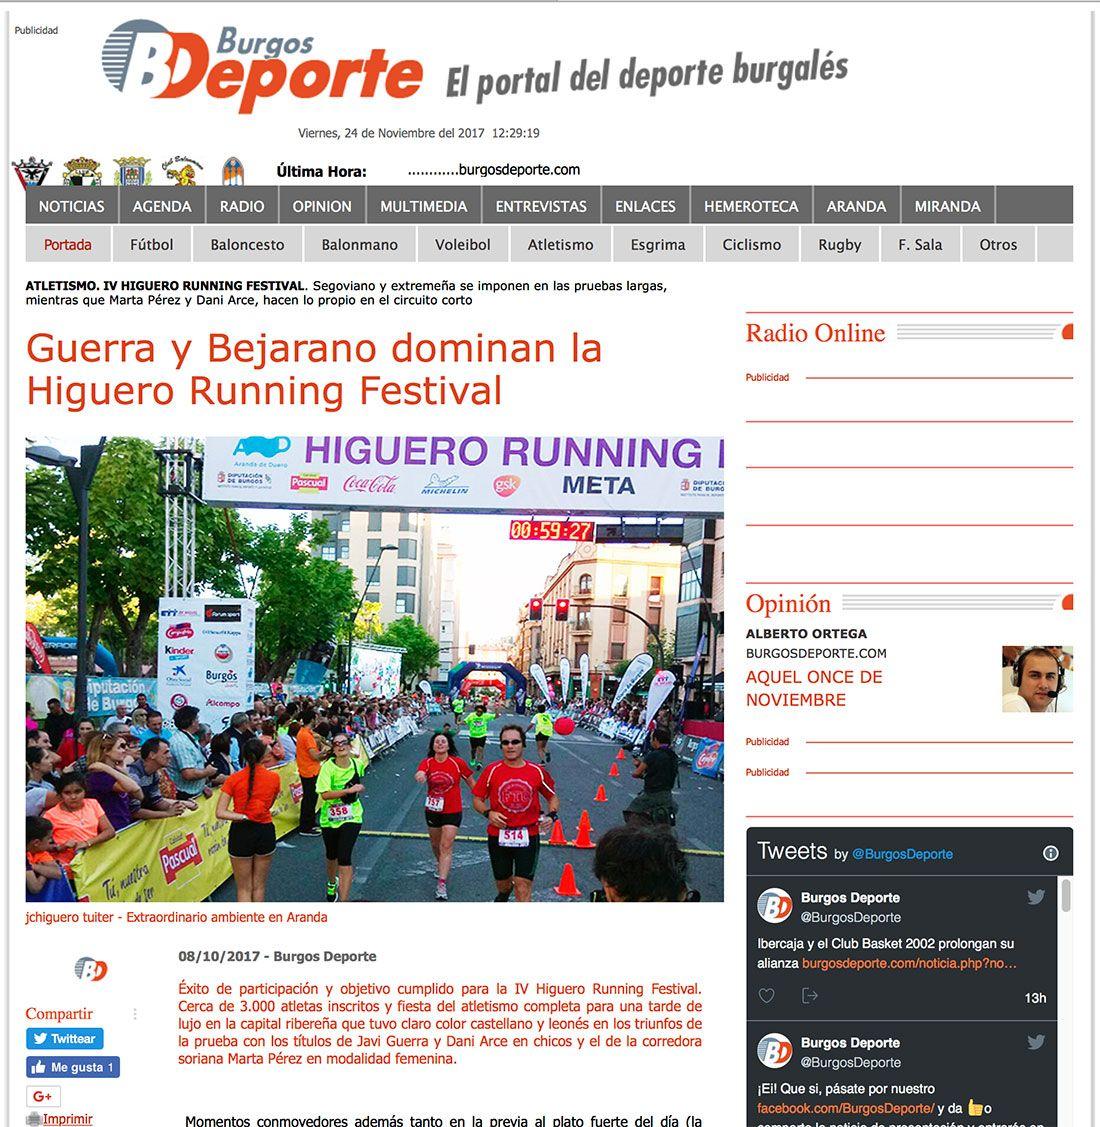 BURGOS DEPORTE